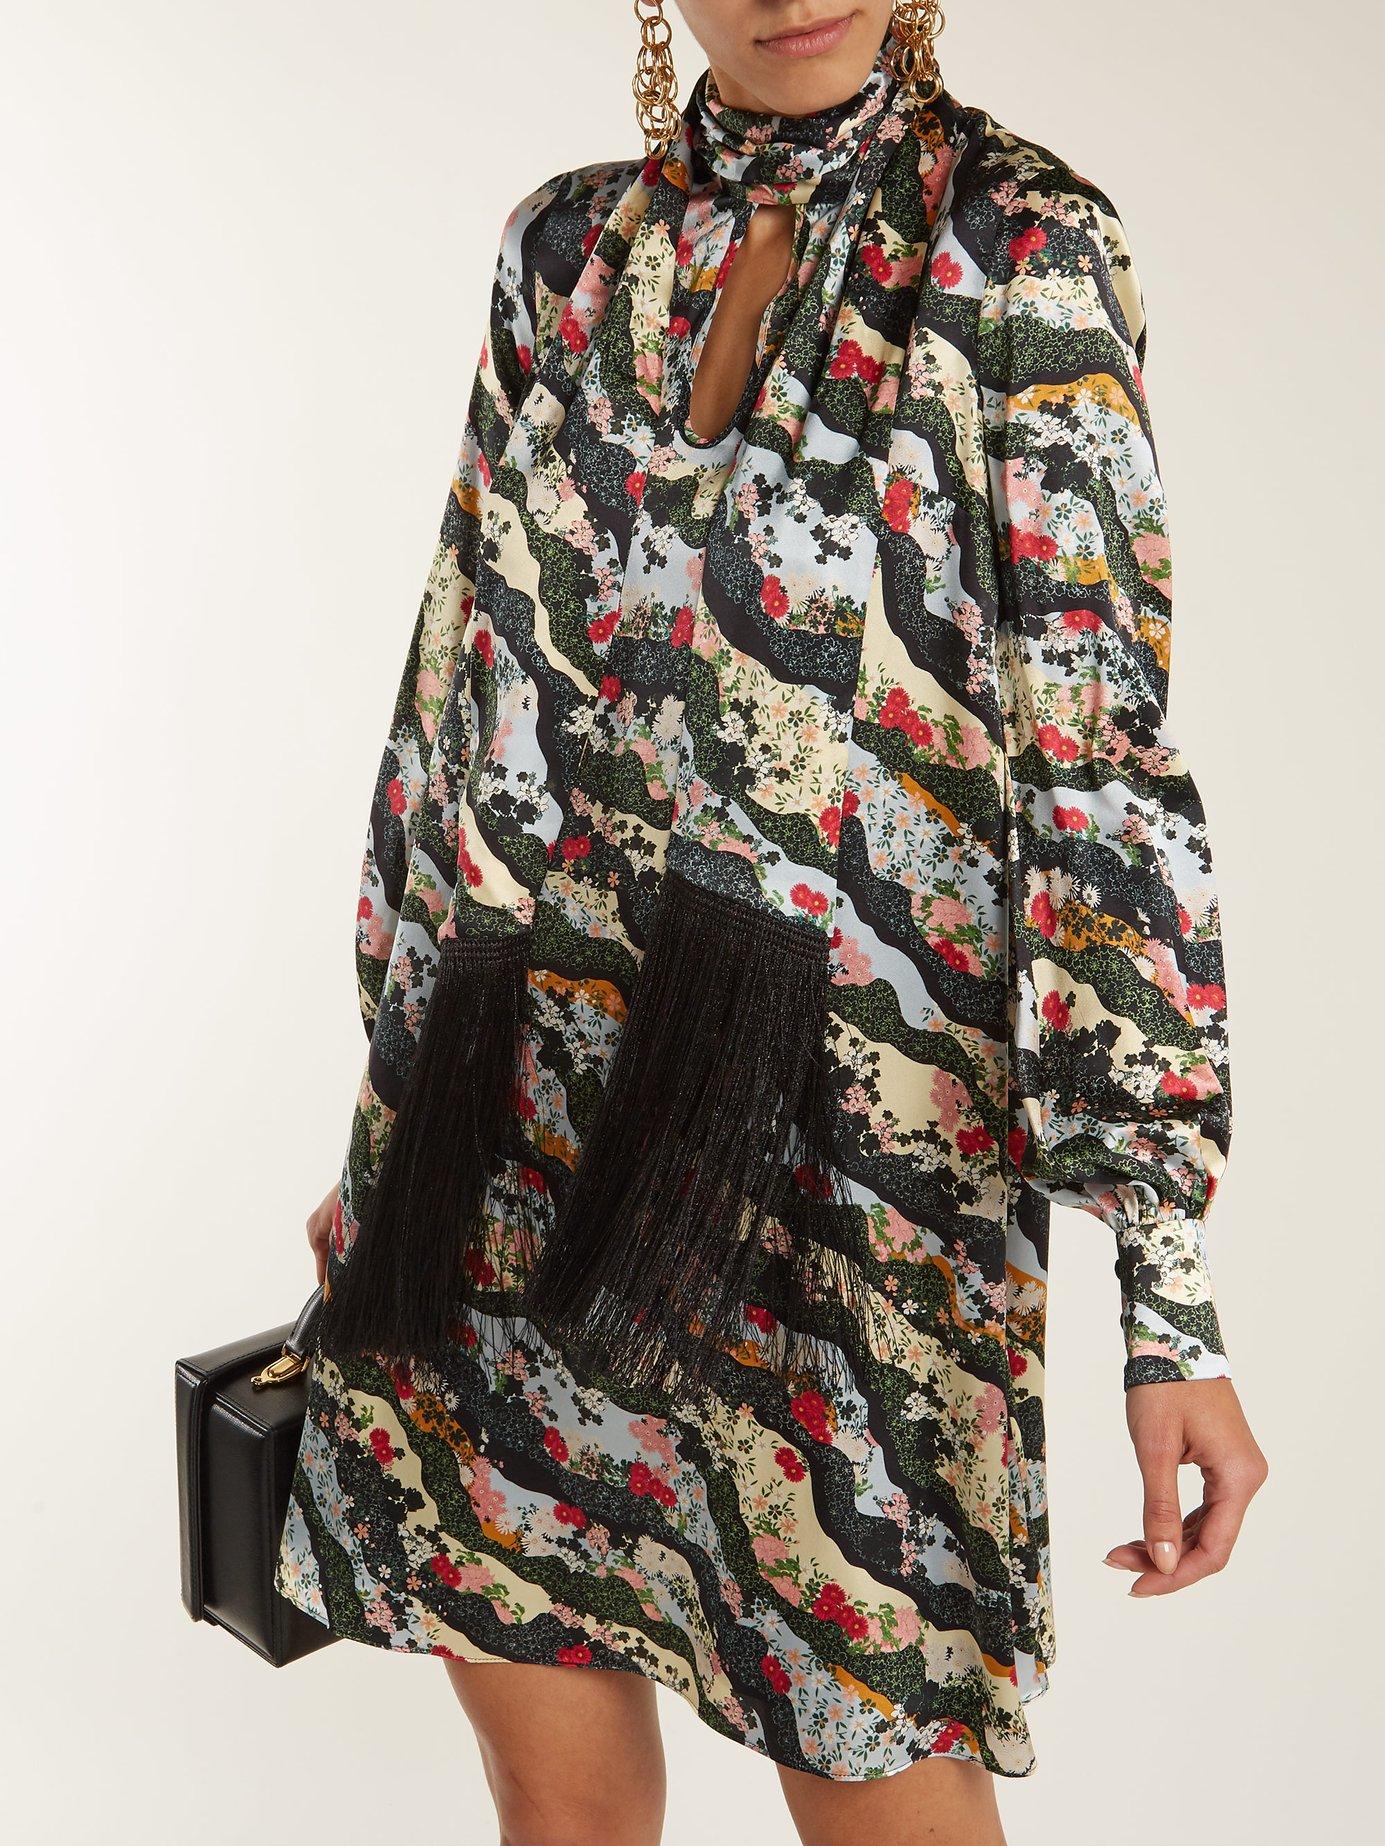 Gwendoline Keiko Marble-print silk dress by Erdem